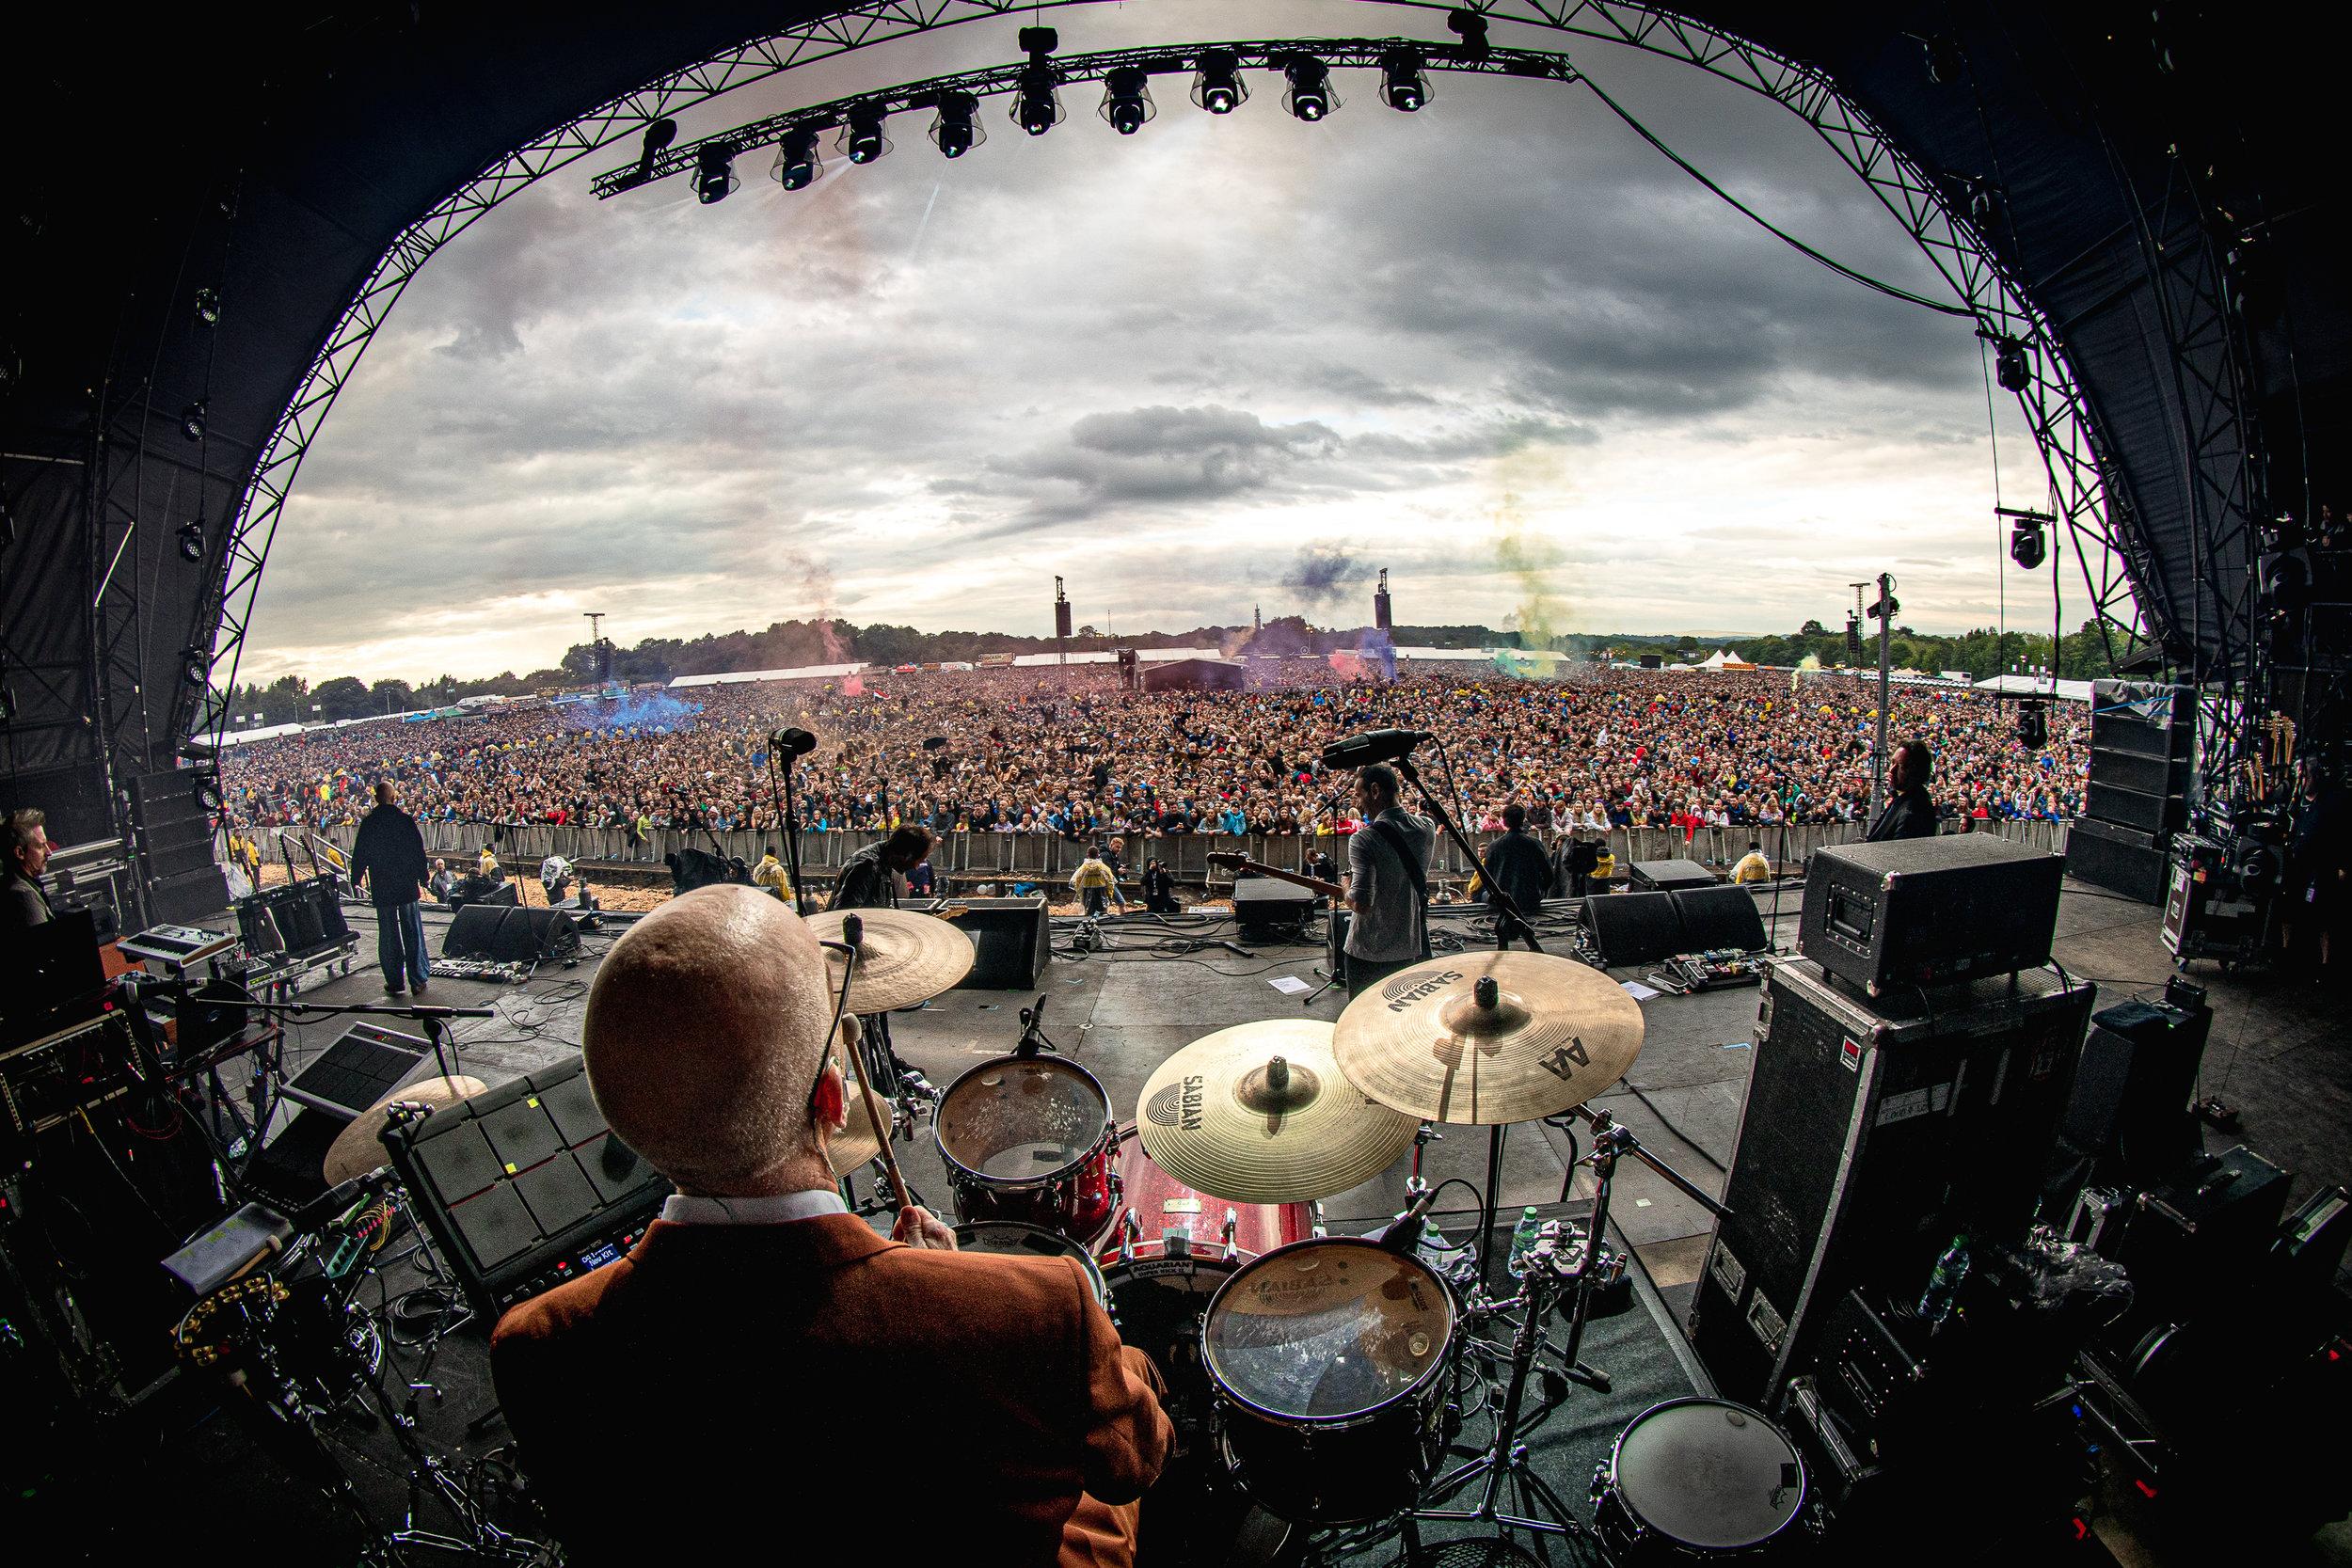 James  - live at Heaton Park, Manchester 15/06/19